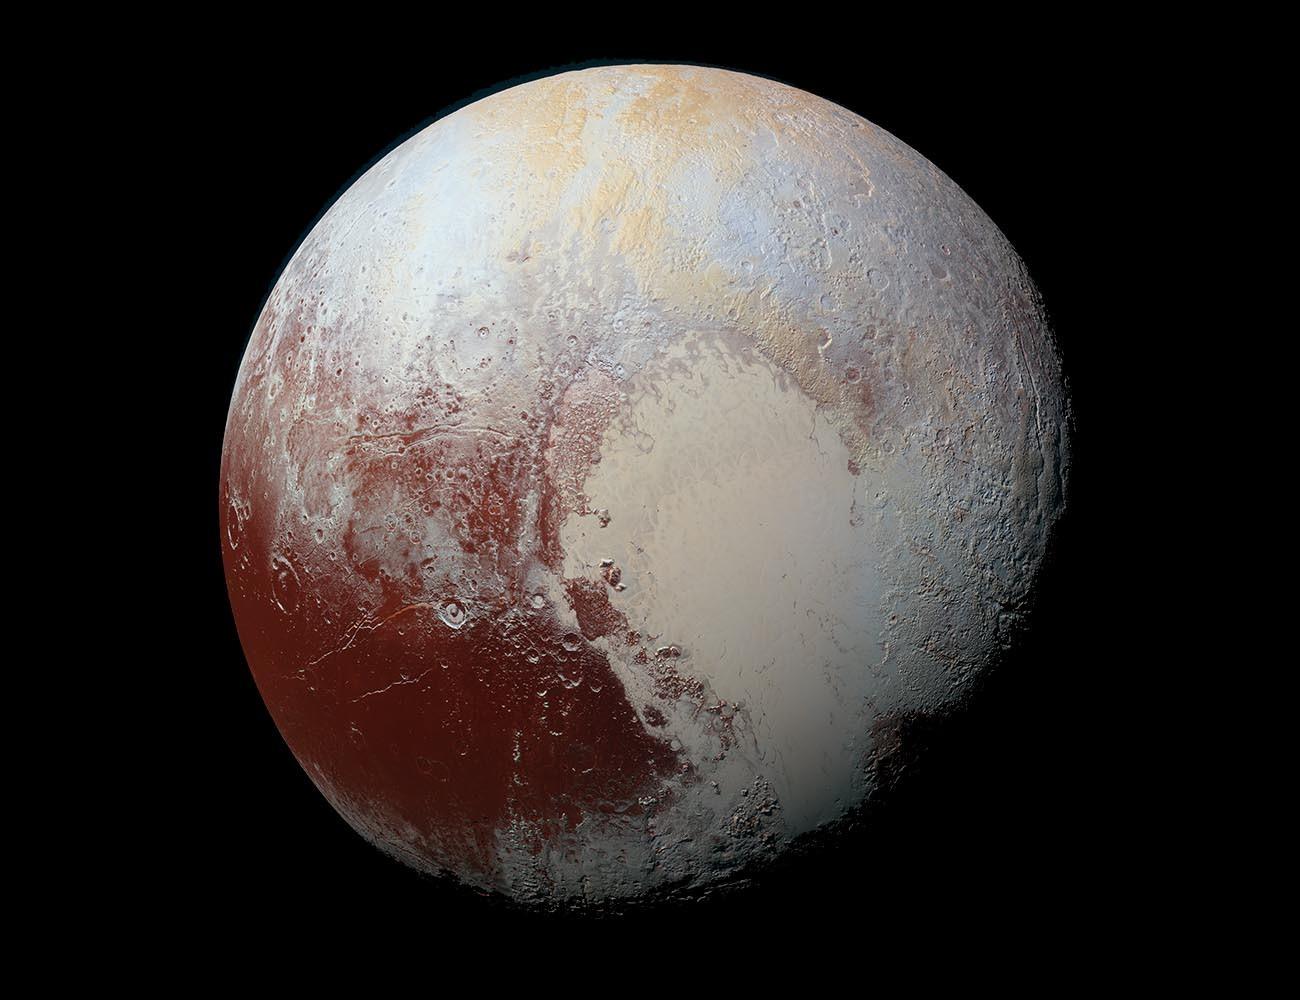 Sputnik-Planitia